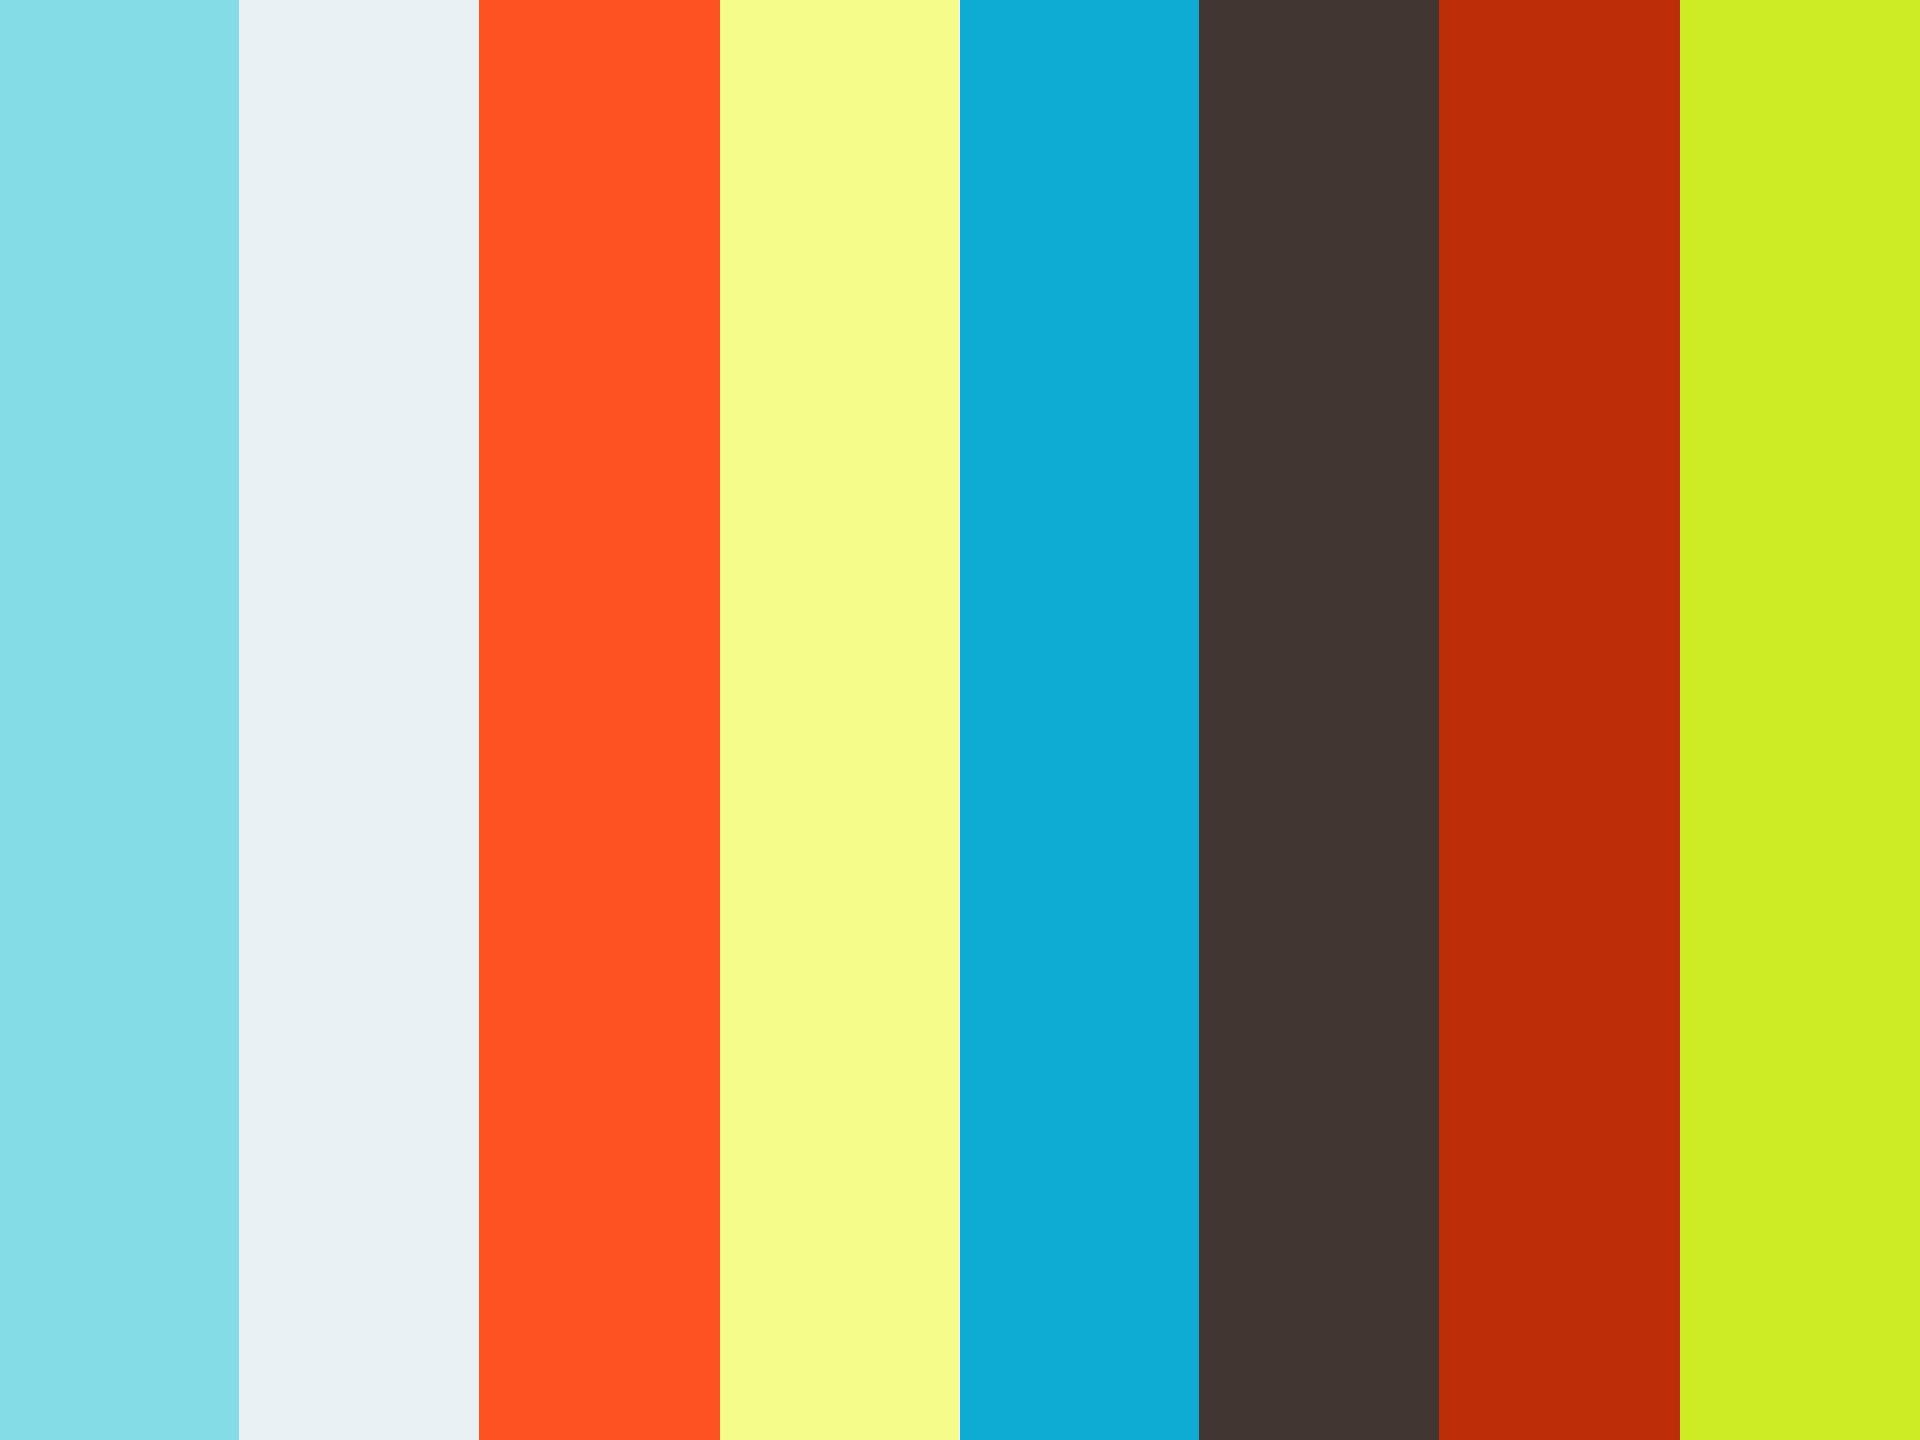 Stiegl Genusstipp 2015 Kolner Haus In Serfaus On Vimeo